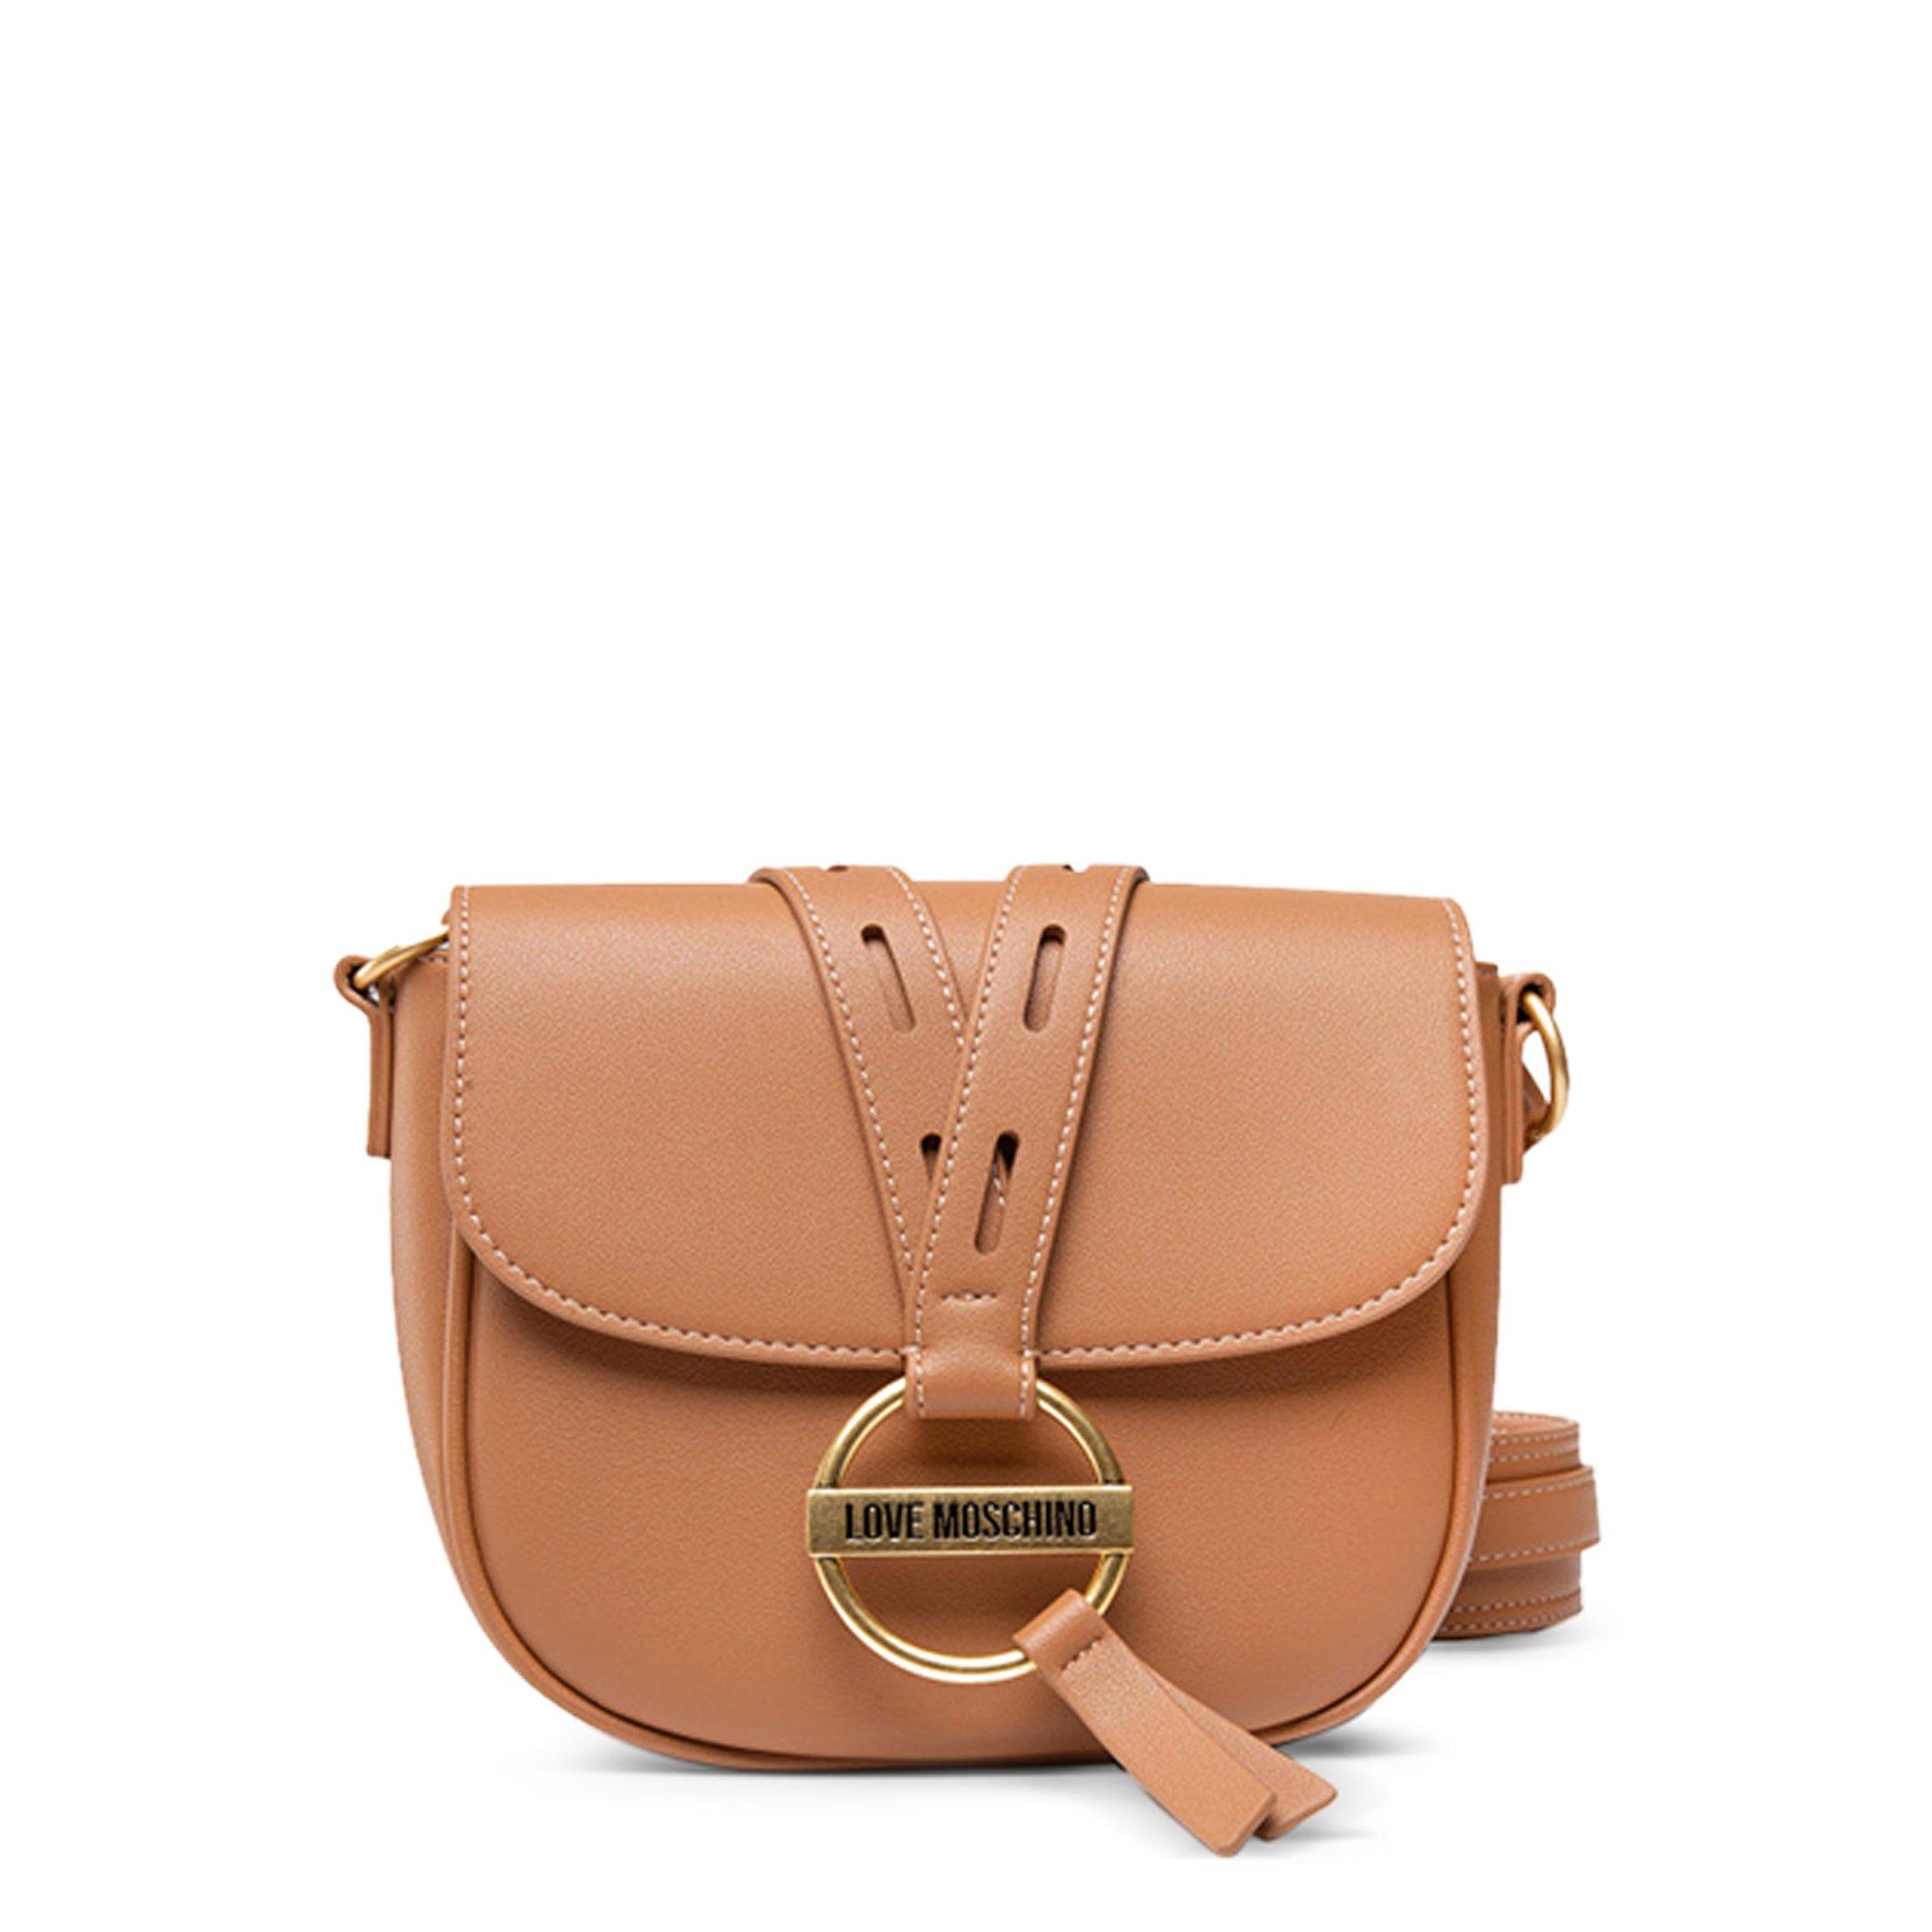 Love Moschino Women's Crossbody Bag Various Colours JC4208PP1DLK0 - brown NOSIZE